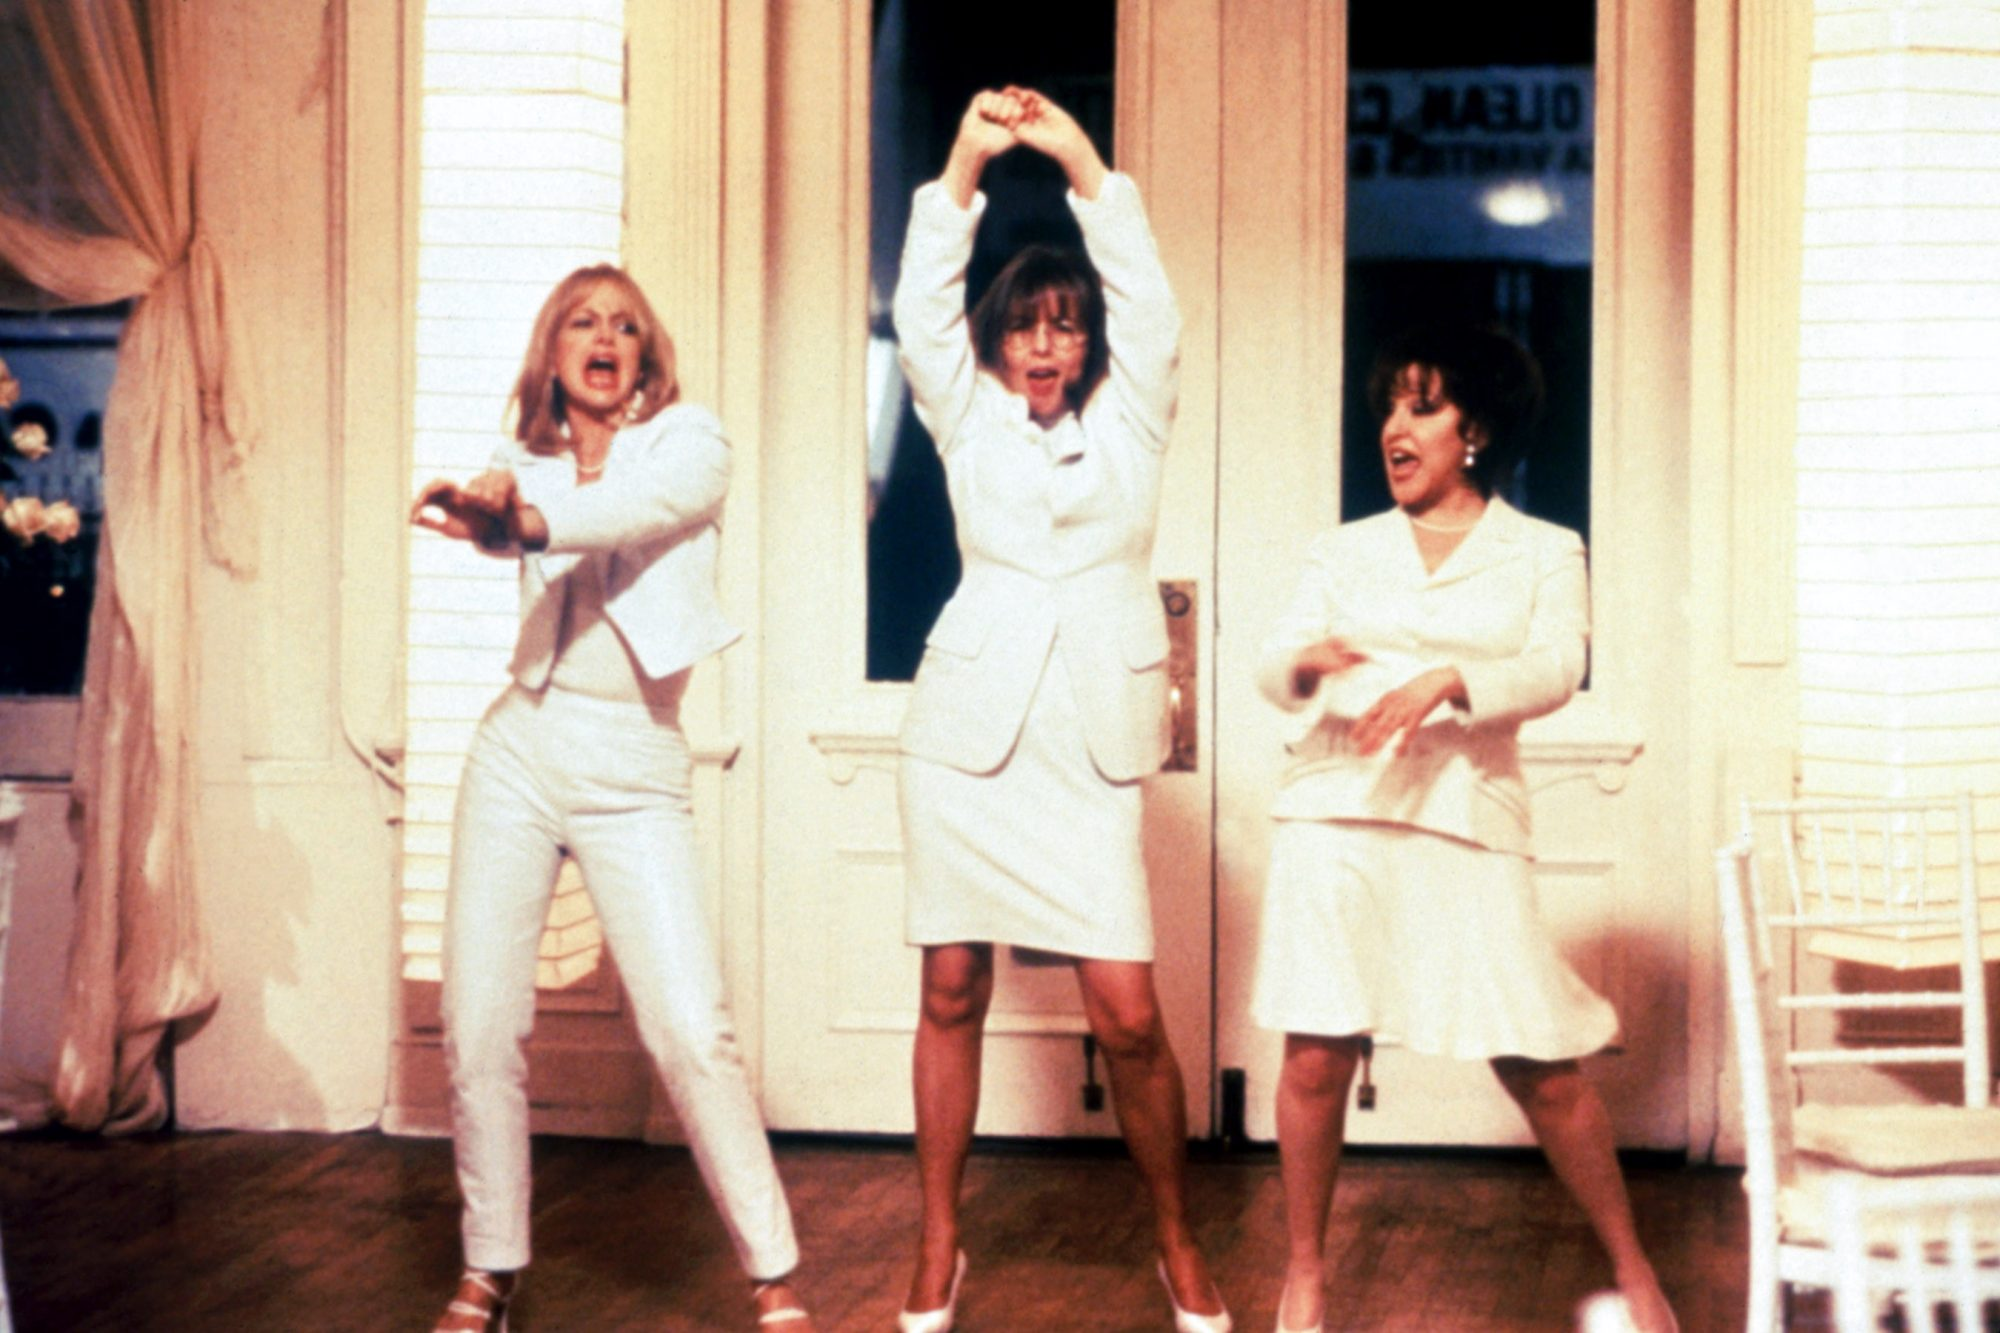 FIRST WIVES CLUB, Goldie Hawn, Diane Keaton, Bette Midler, 1996